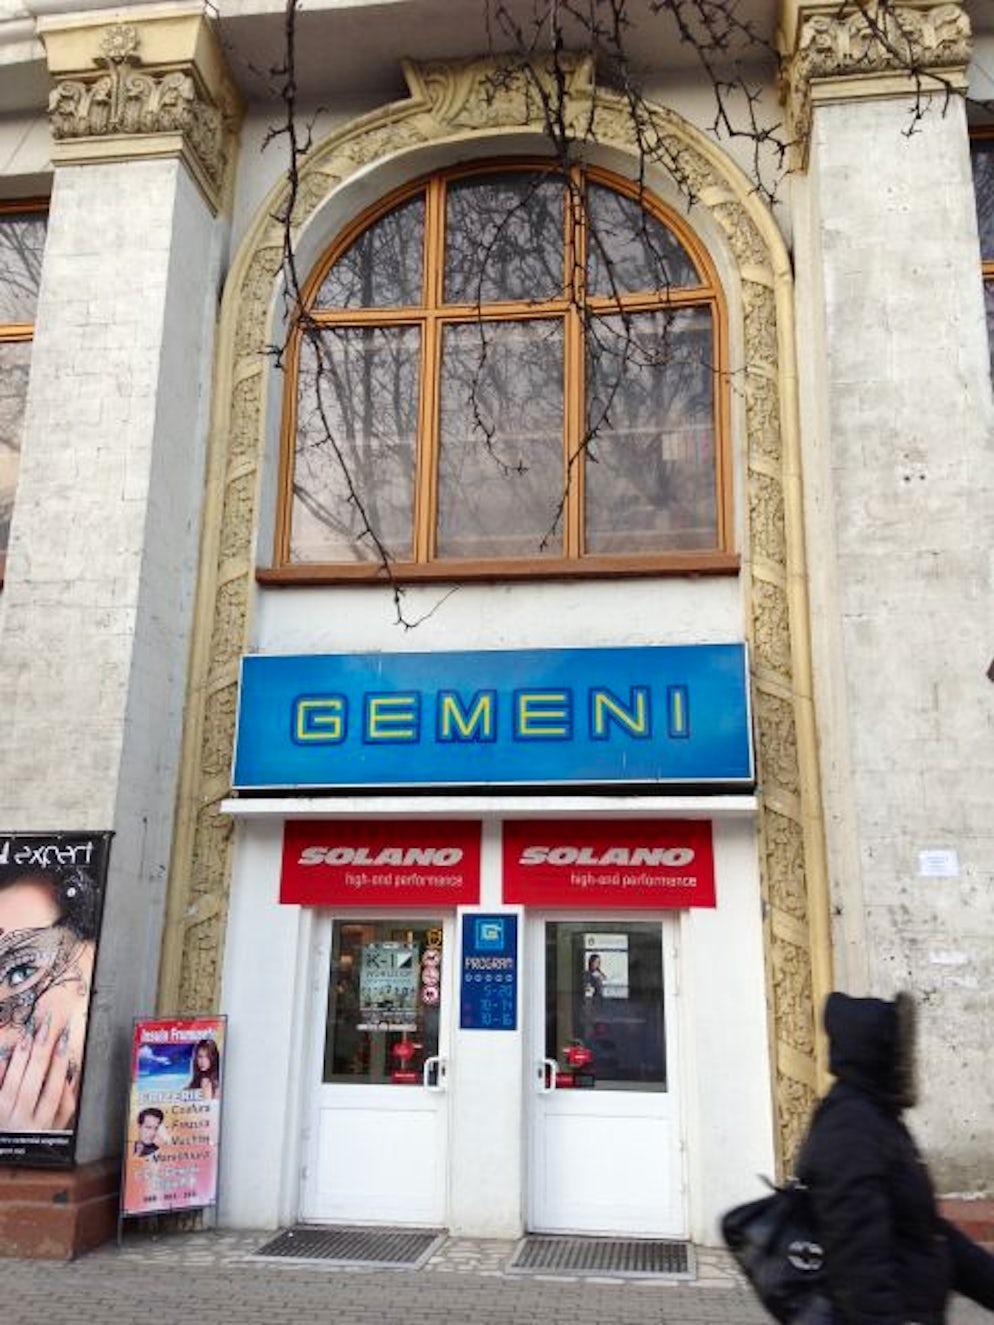 Picture © Credits to Wikimedia/Adina Aruştei